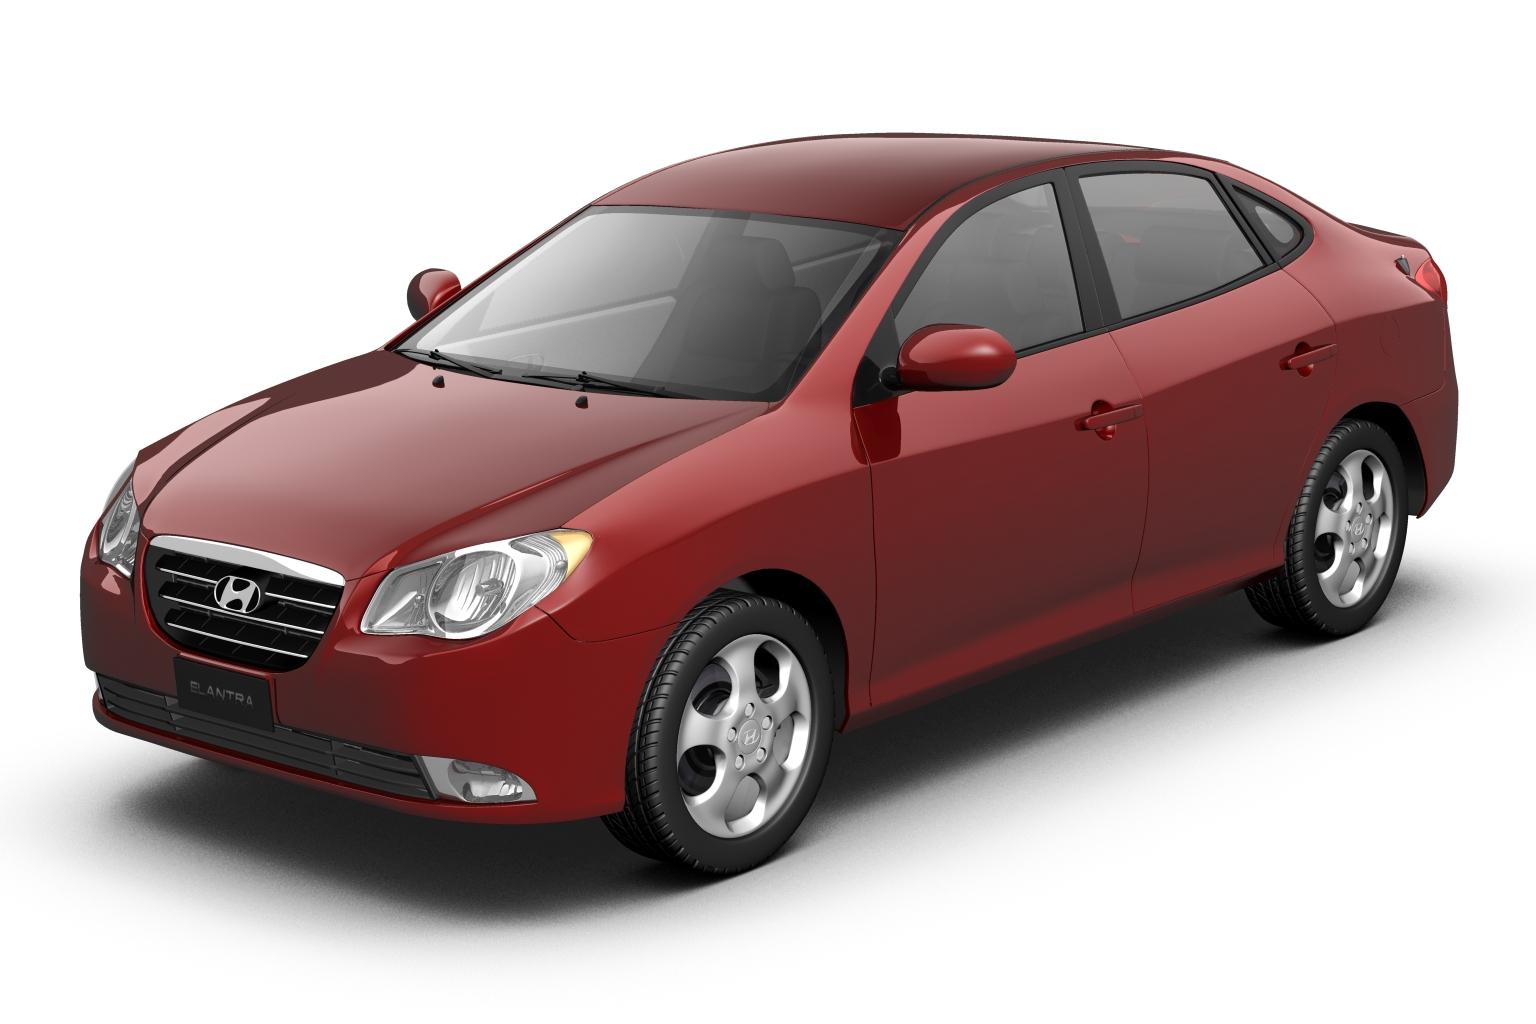 2007 hyundai elantra (avante) 3d model 3ds max fbx lwo hrc xsi obj 205402